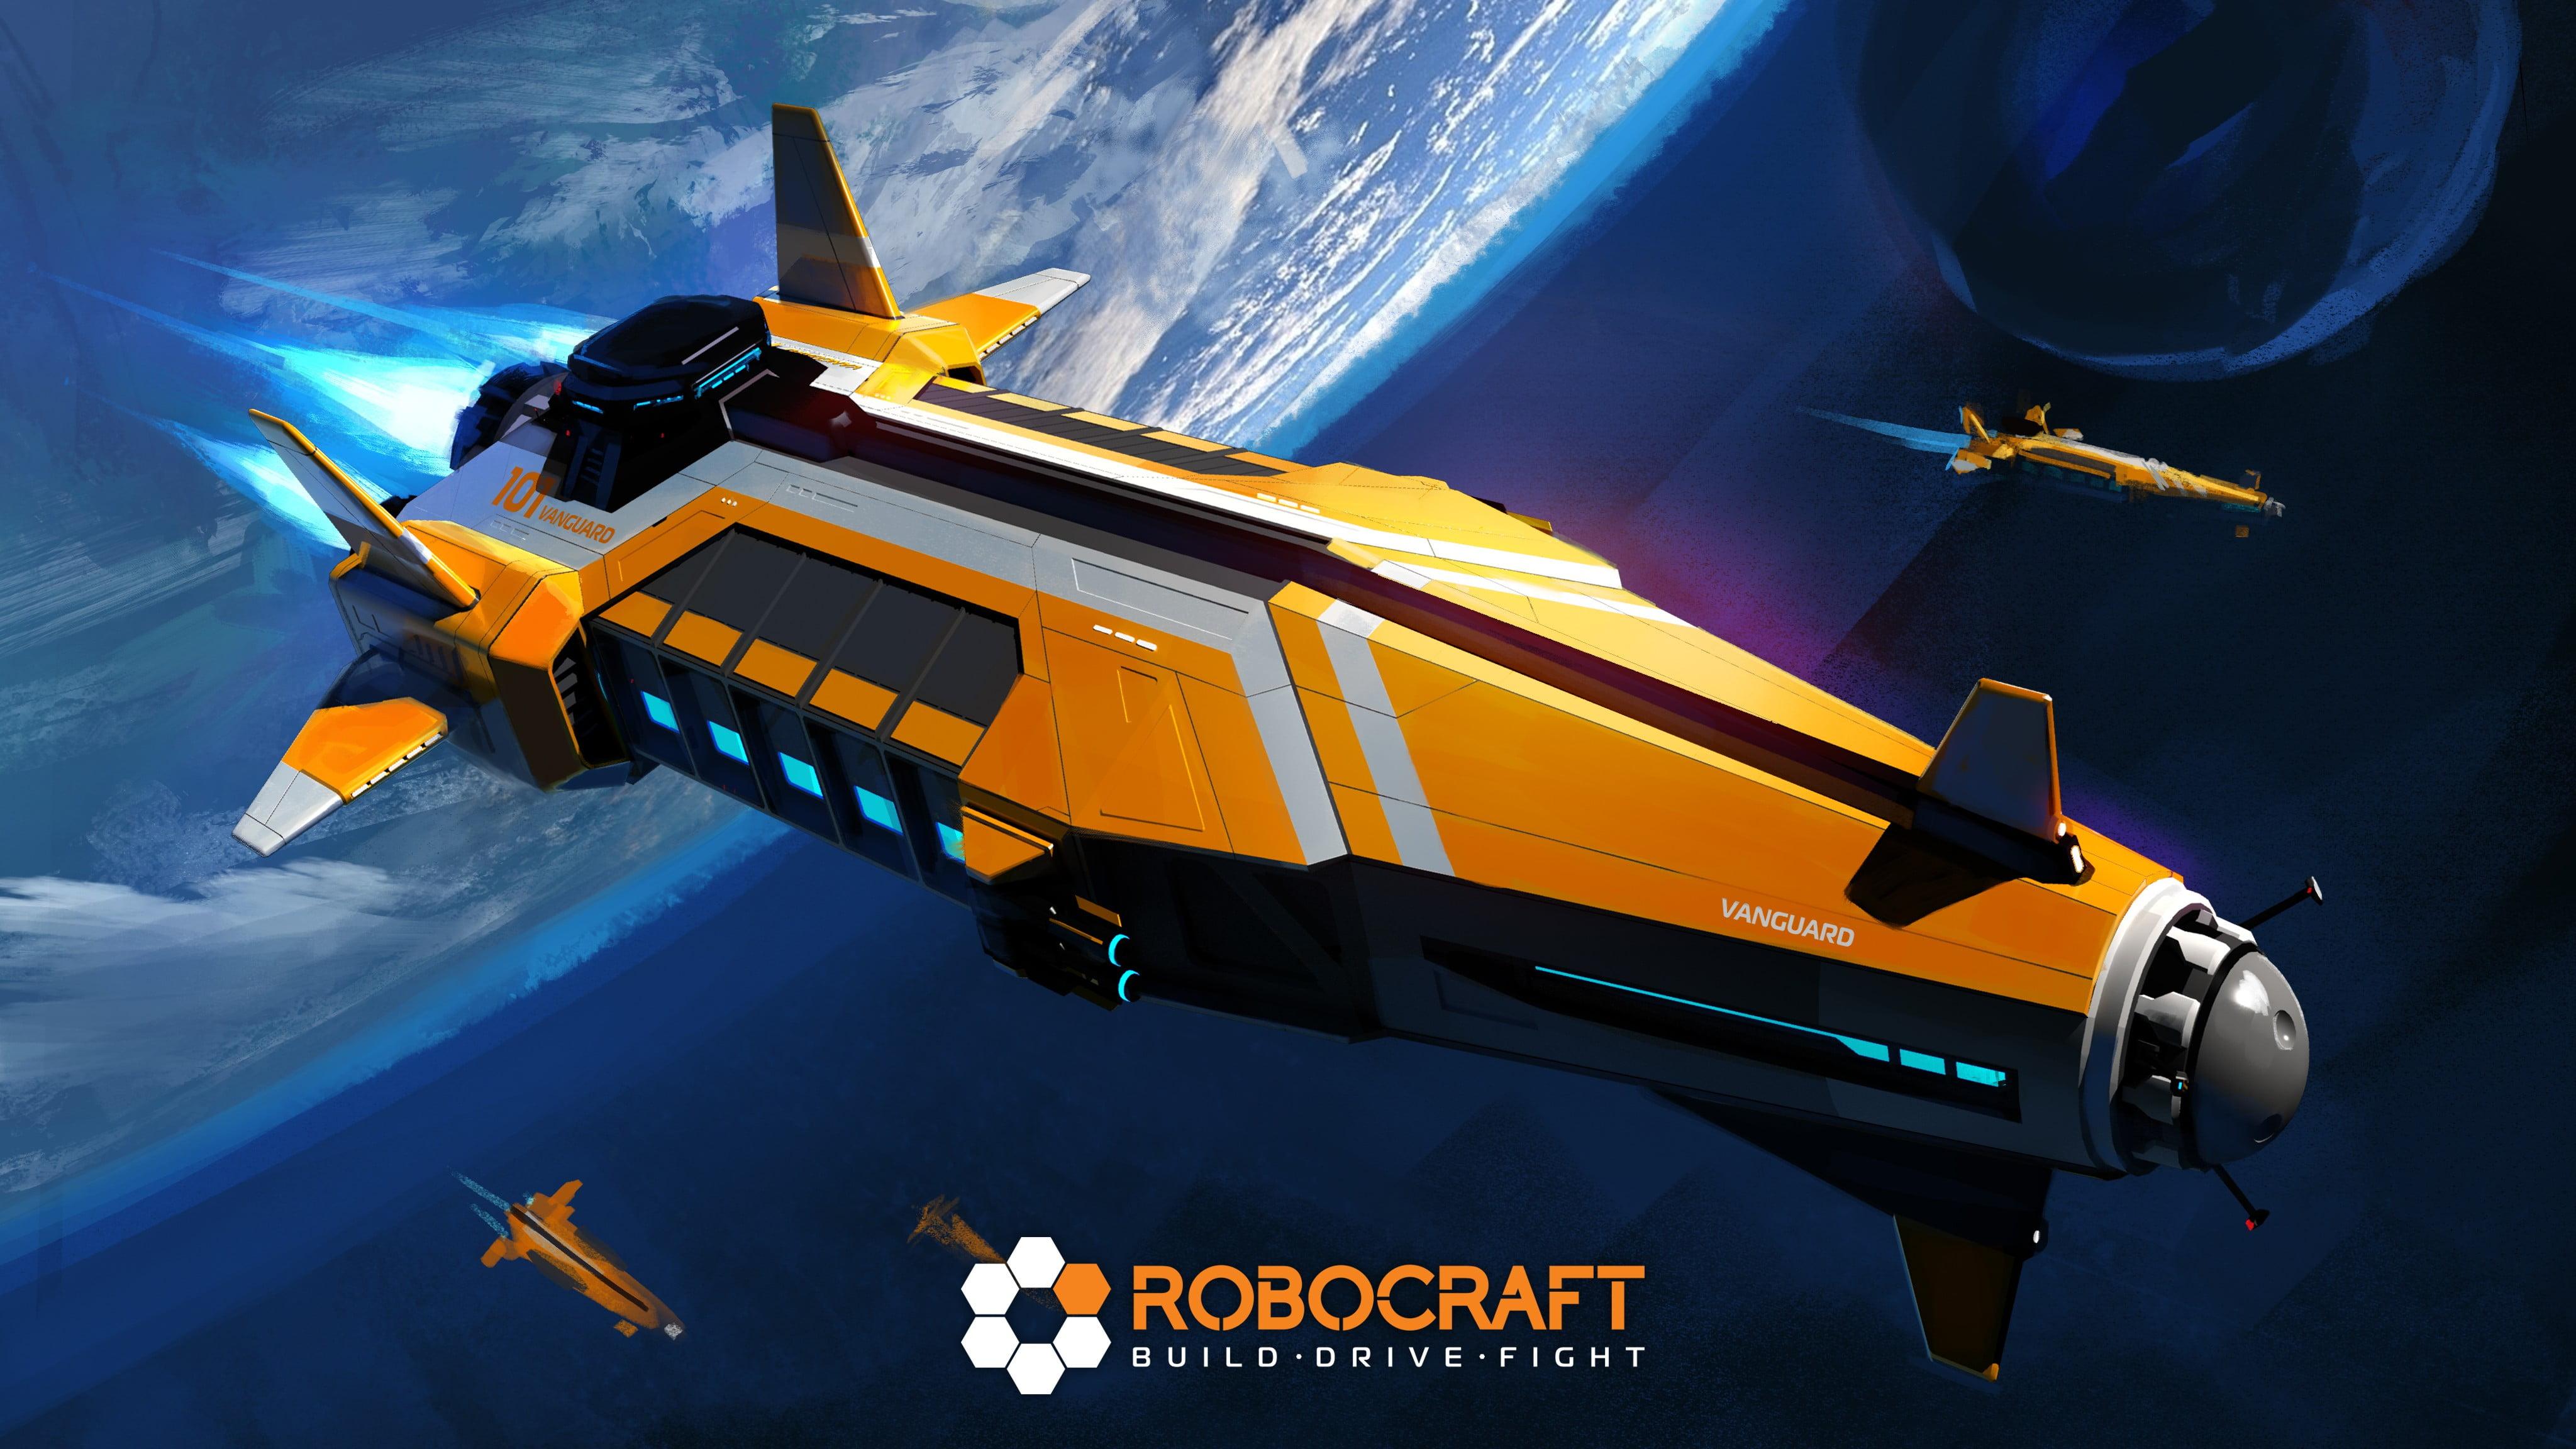 Robocraft cover robocraft robot video games HD wallpaper 4096x2304